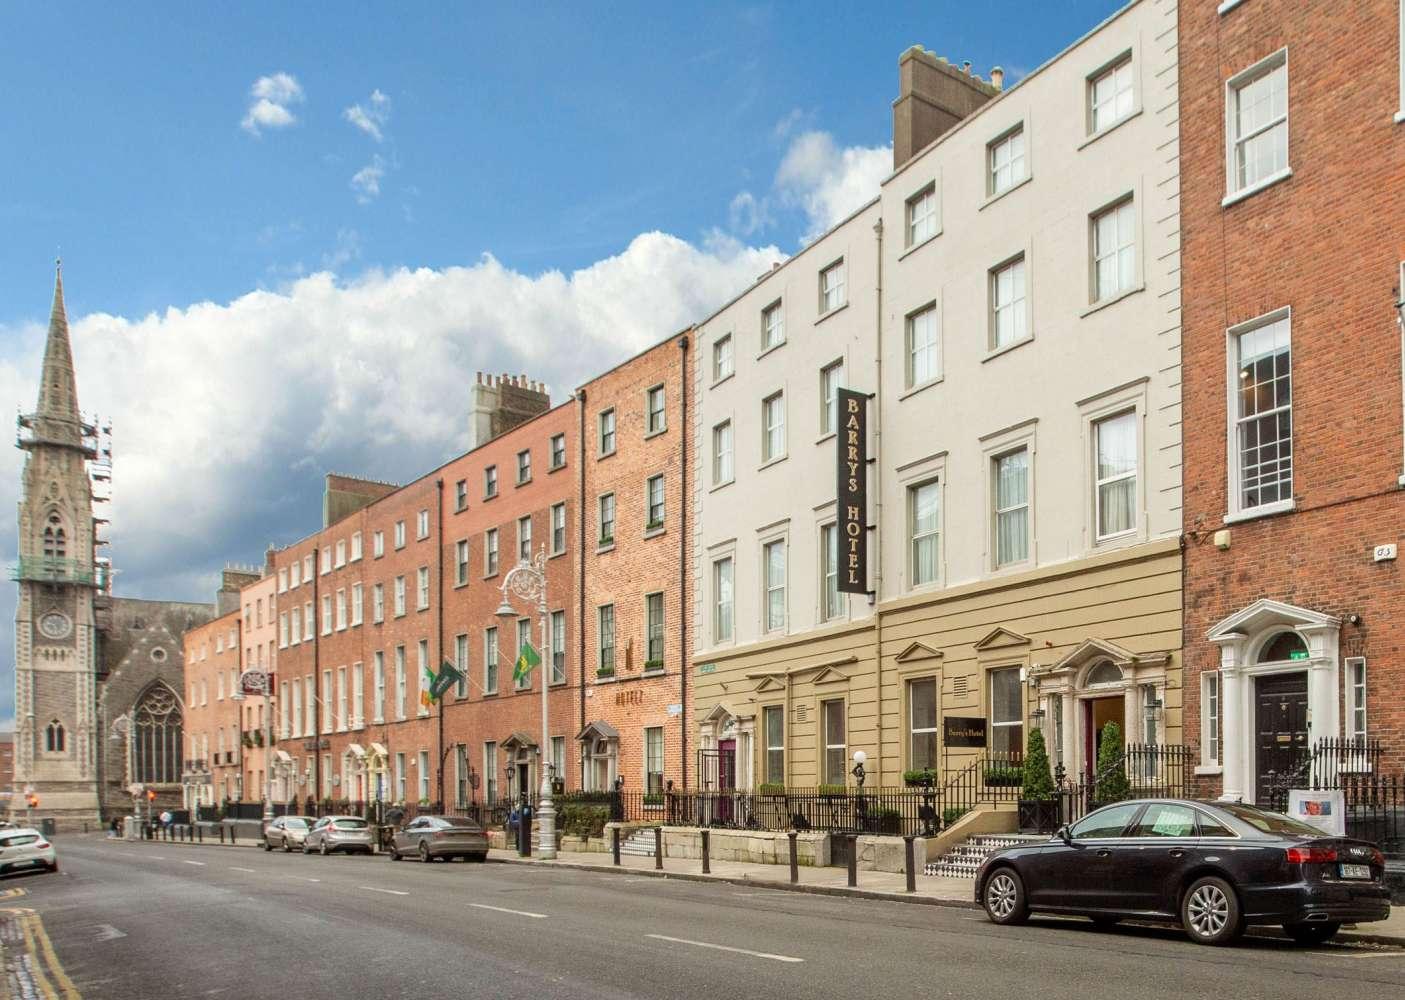 Hotels & hospitality Dublin 1, D01 PP66 - Barry's Hotel